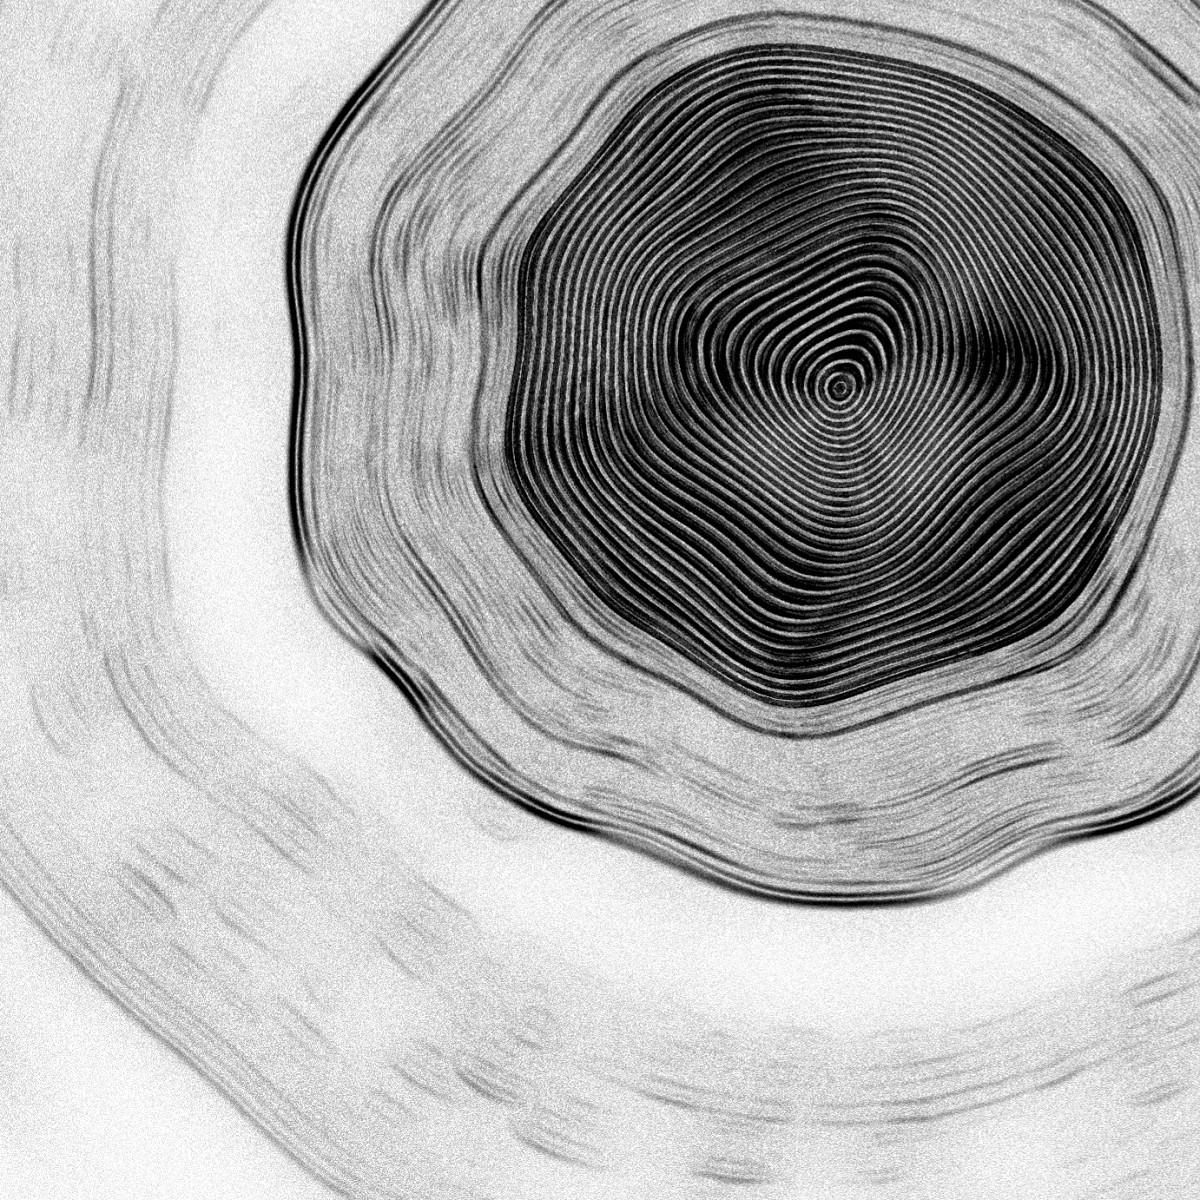 shelly-alon-Interaktive Visualisierung